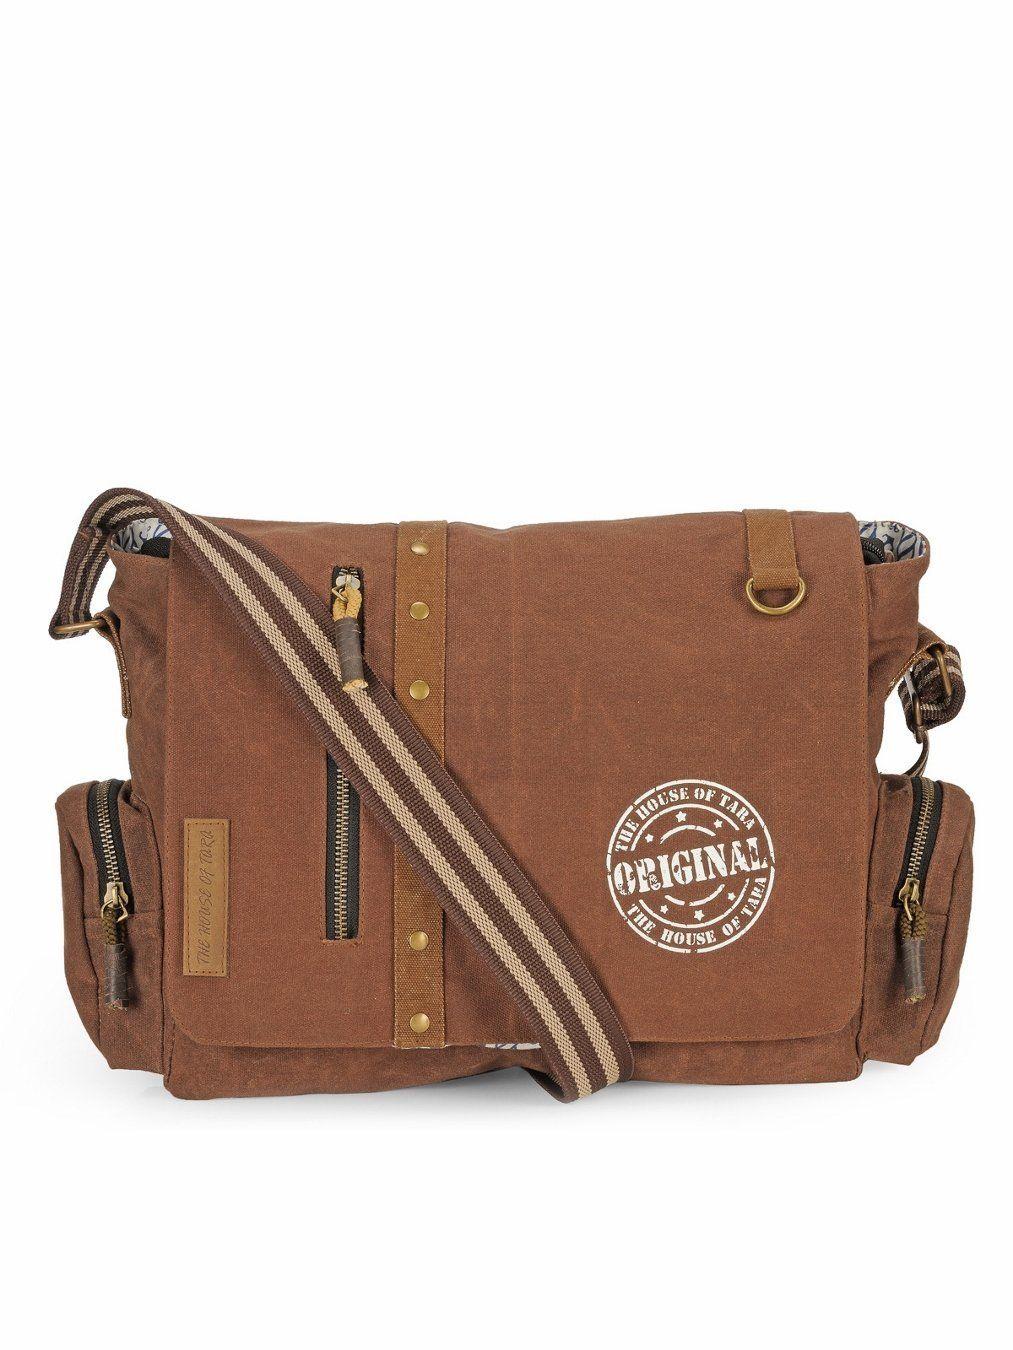 The House Of Tara Vintage Canvas Crossbody Travel Office Business Messenger  Bag (Rustic Brown) HTMB 053 8e047e19a6115